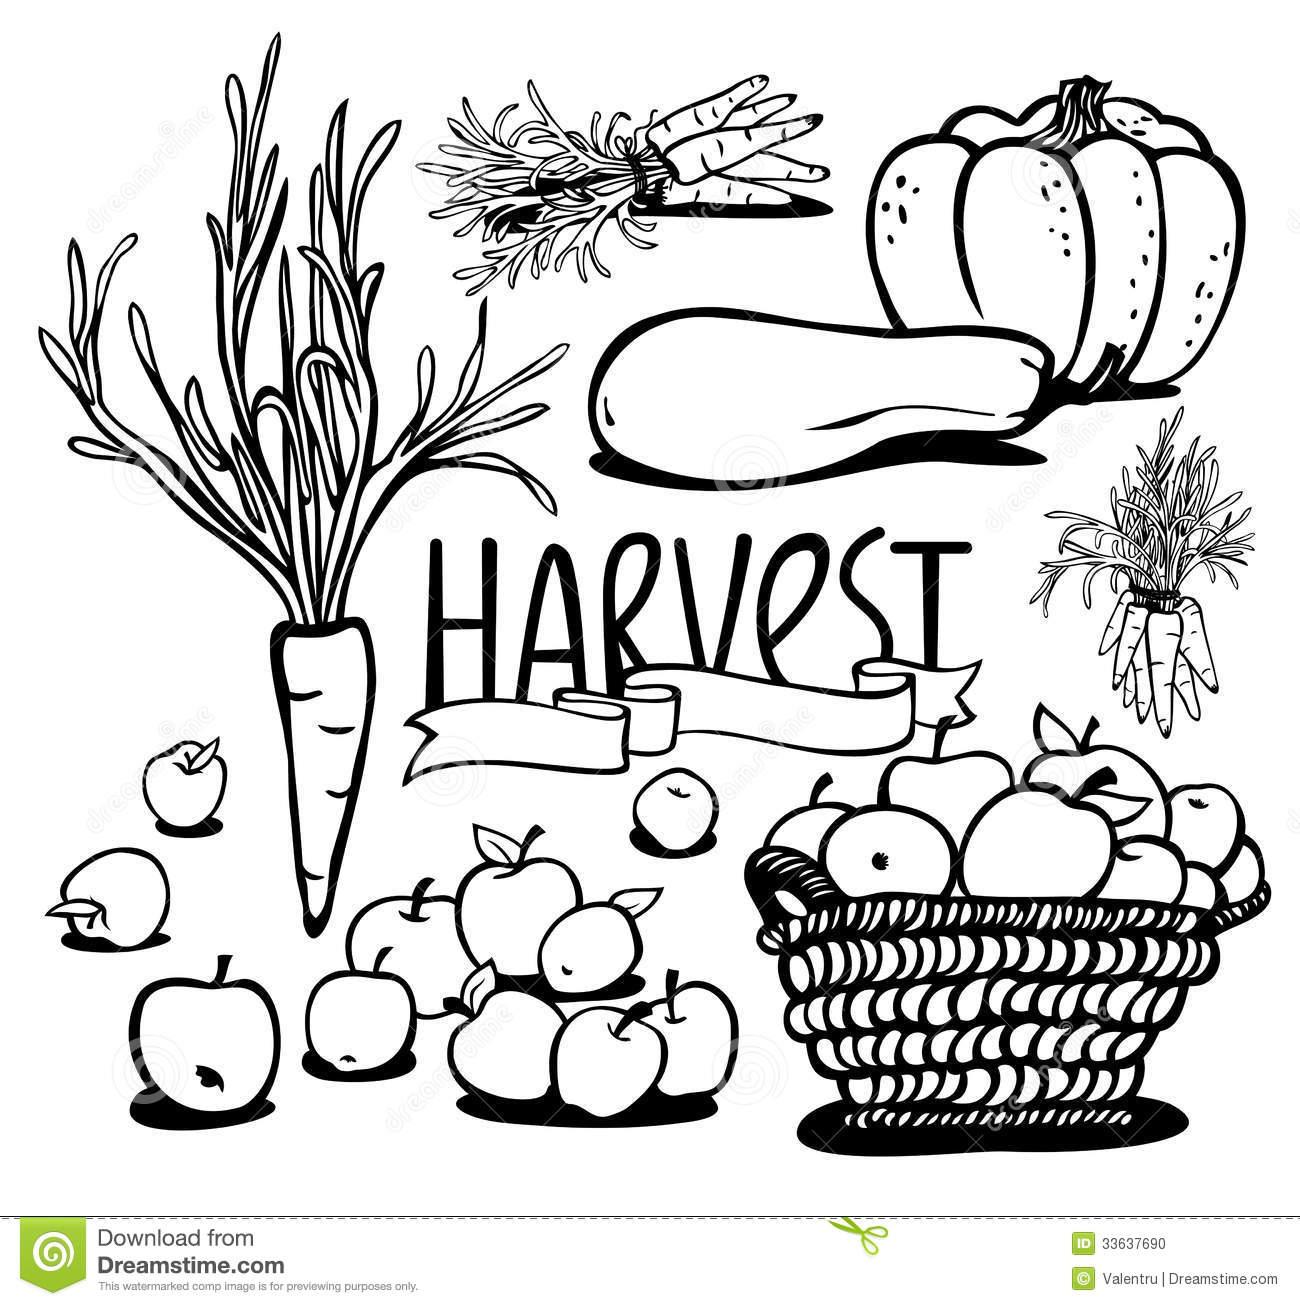 Harvest clipart black and white clip transparent library Harvest clipart black and white » Clipart Station clip transparent library